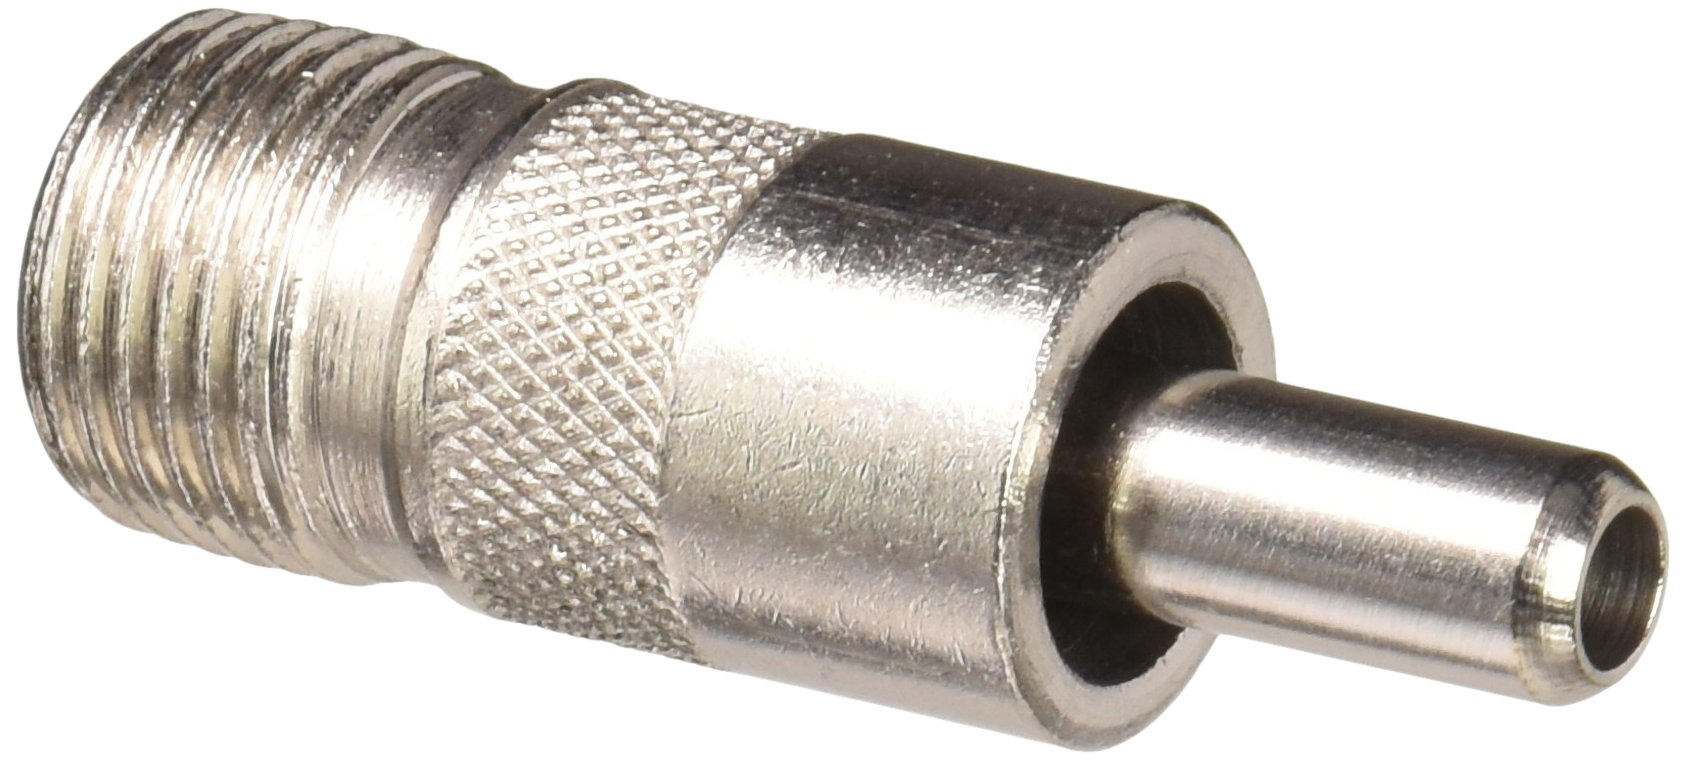 Lixit 30-0915-020 L-70 20pk Water Nipple by Lixit (Image #2)